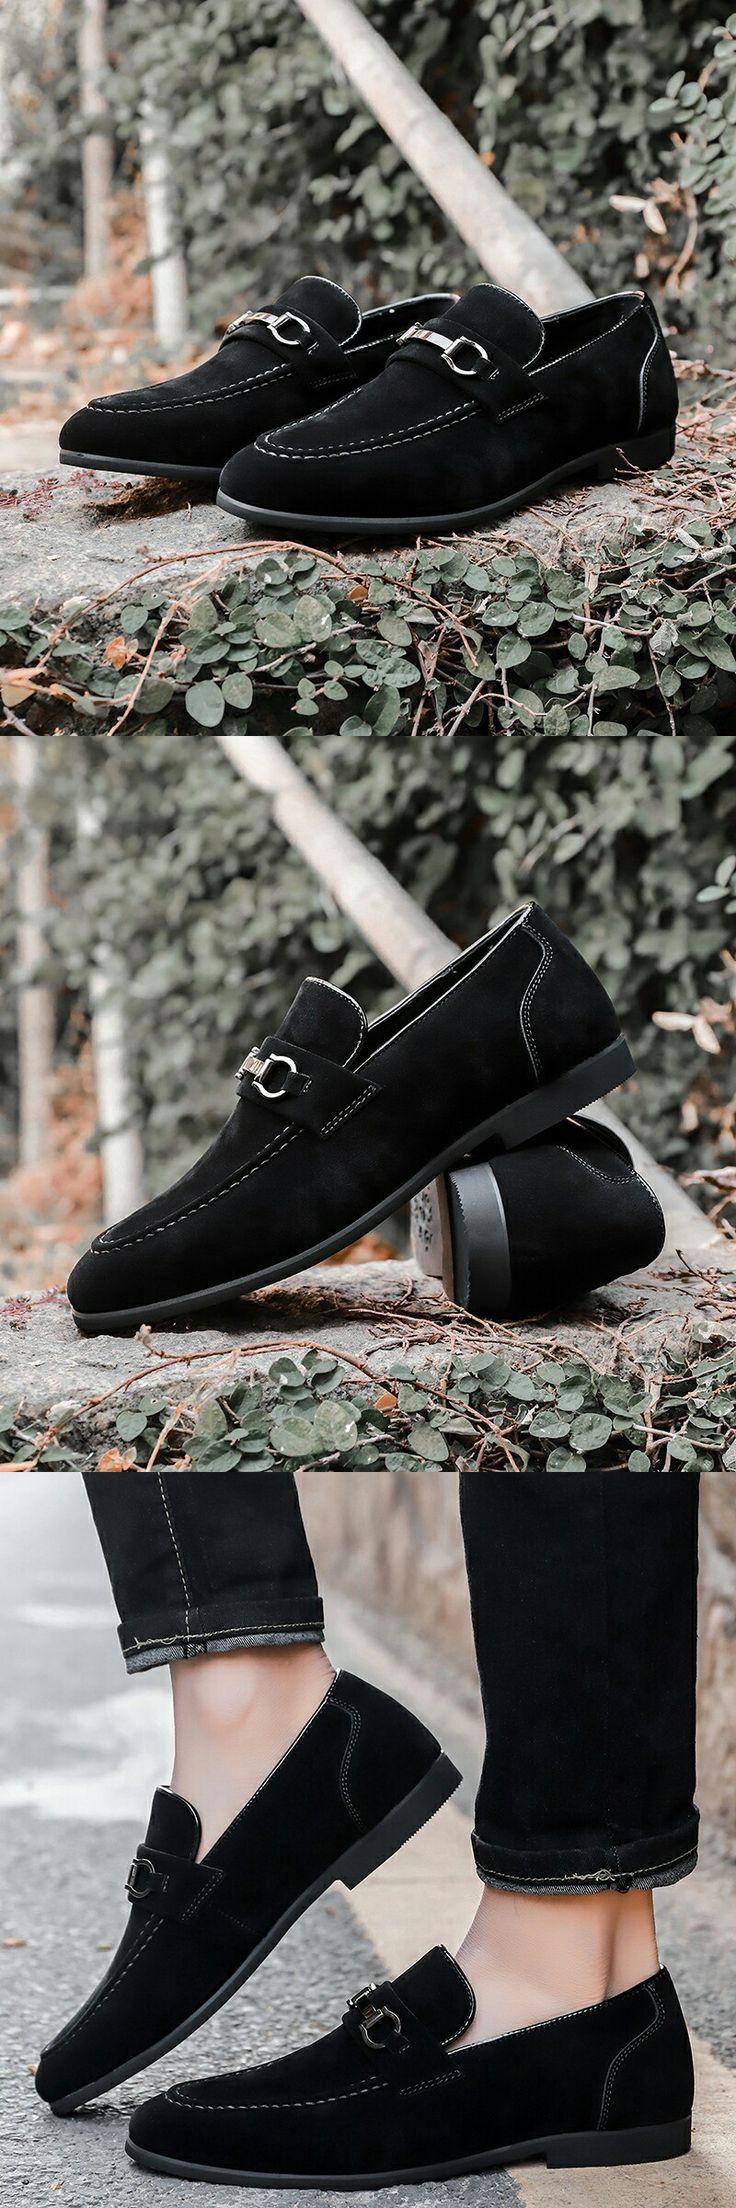 US $24.98<Click to buy> Prelesty Men Formal Shoes Horsebit Suede Tassels Loafers